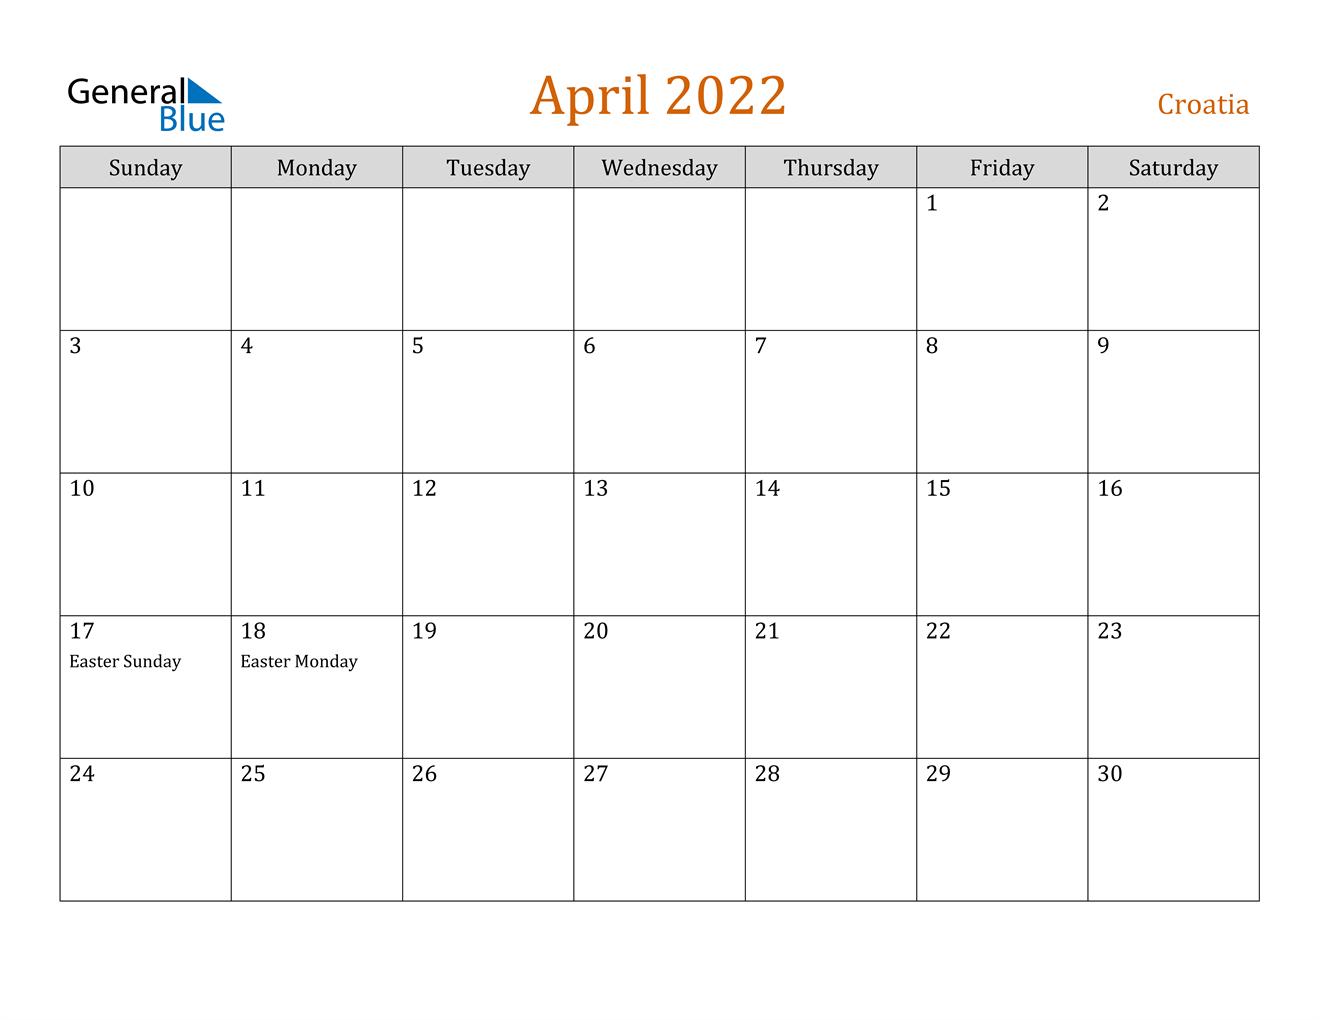 April 2022 Calendar - Croatia in Calendars March April And May 2022 Calendar